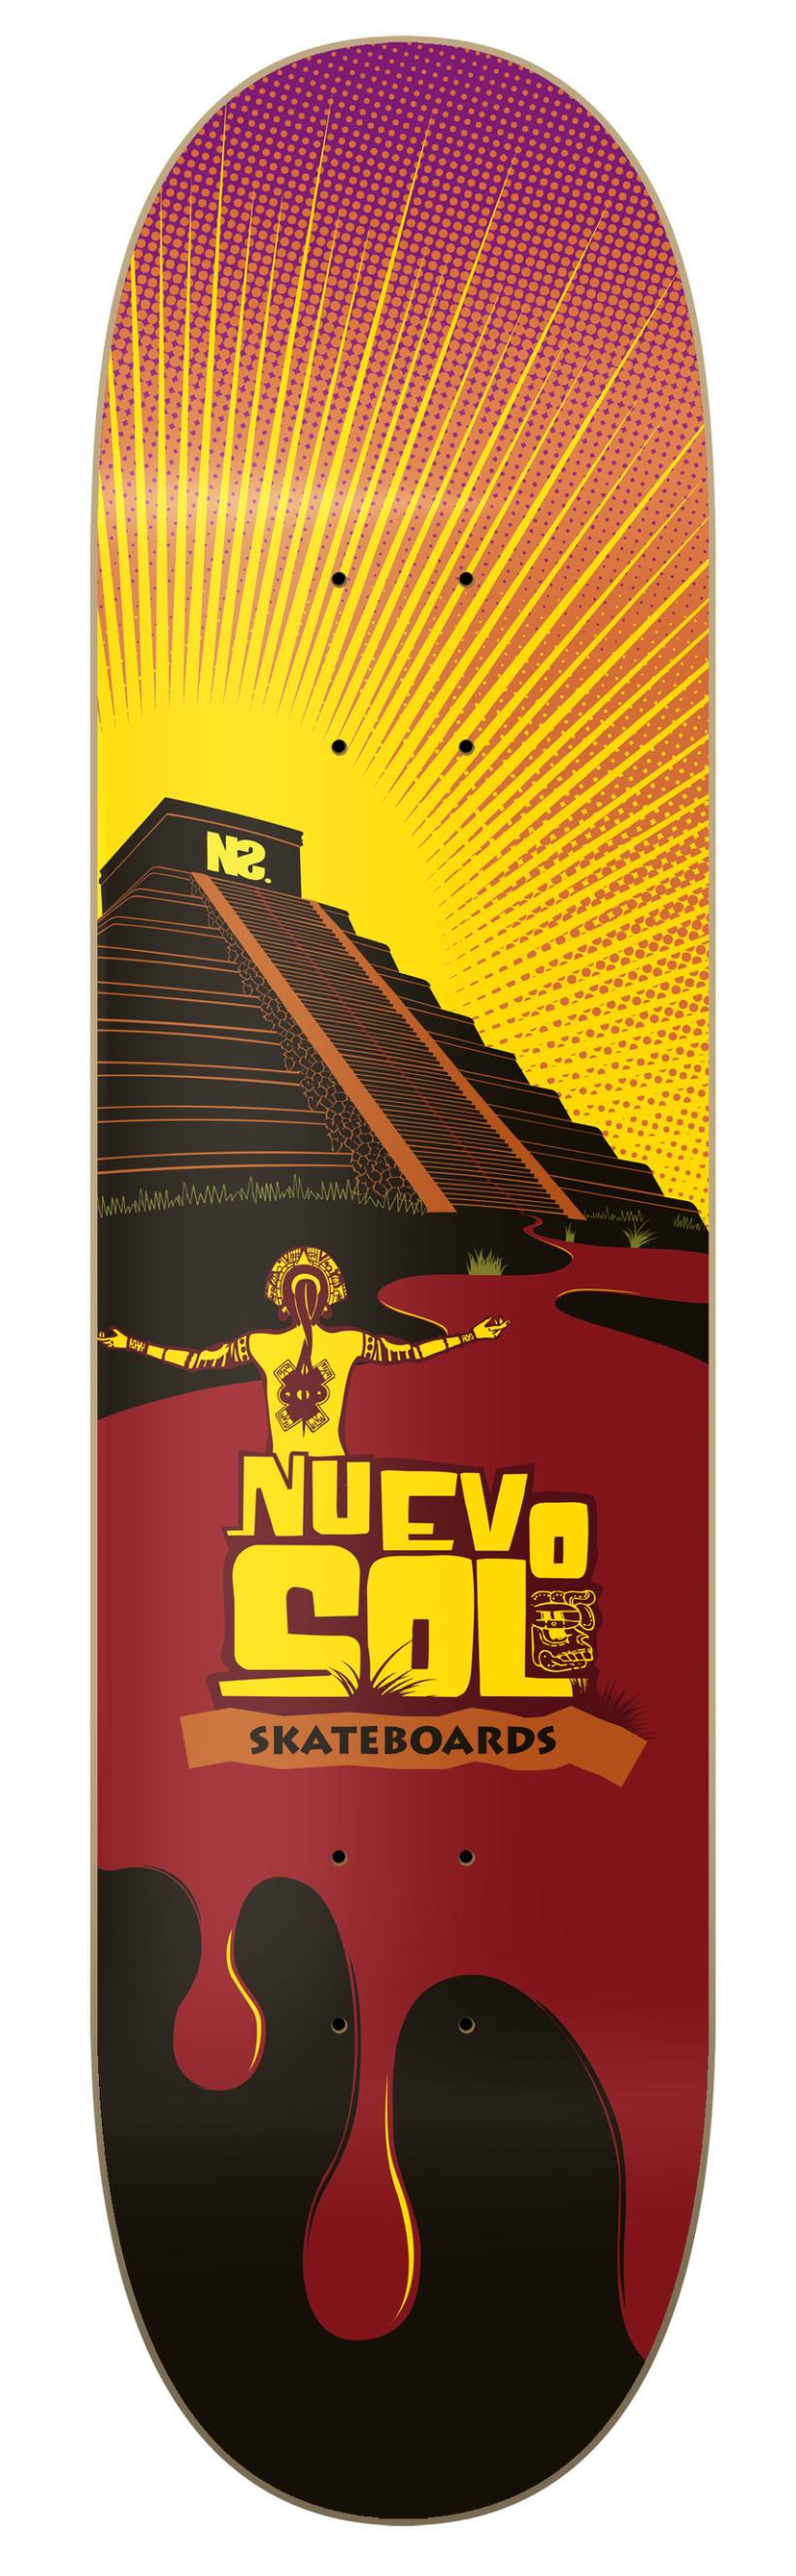 Tabla Nuevo Sol 1